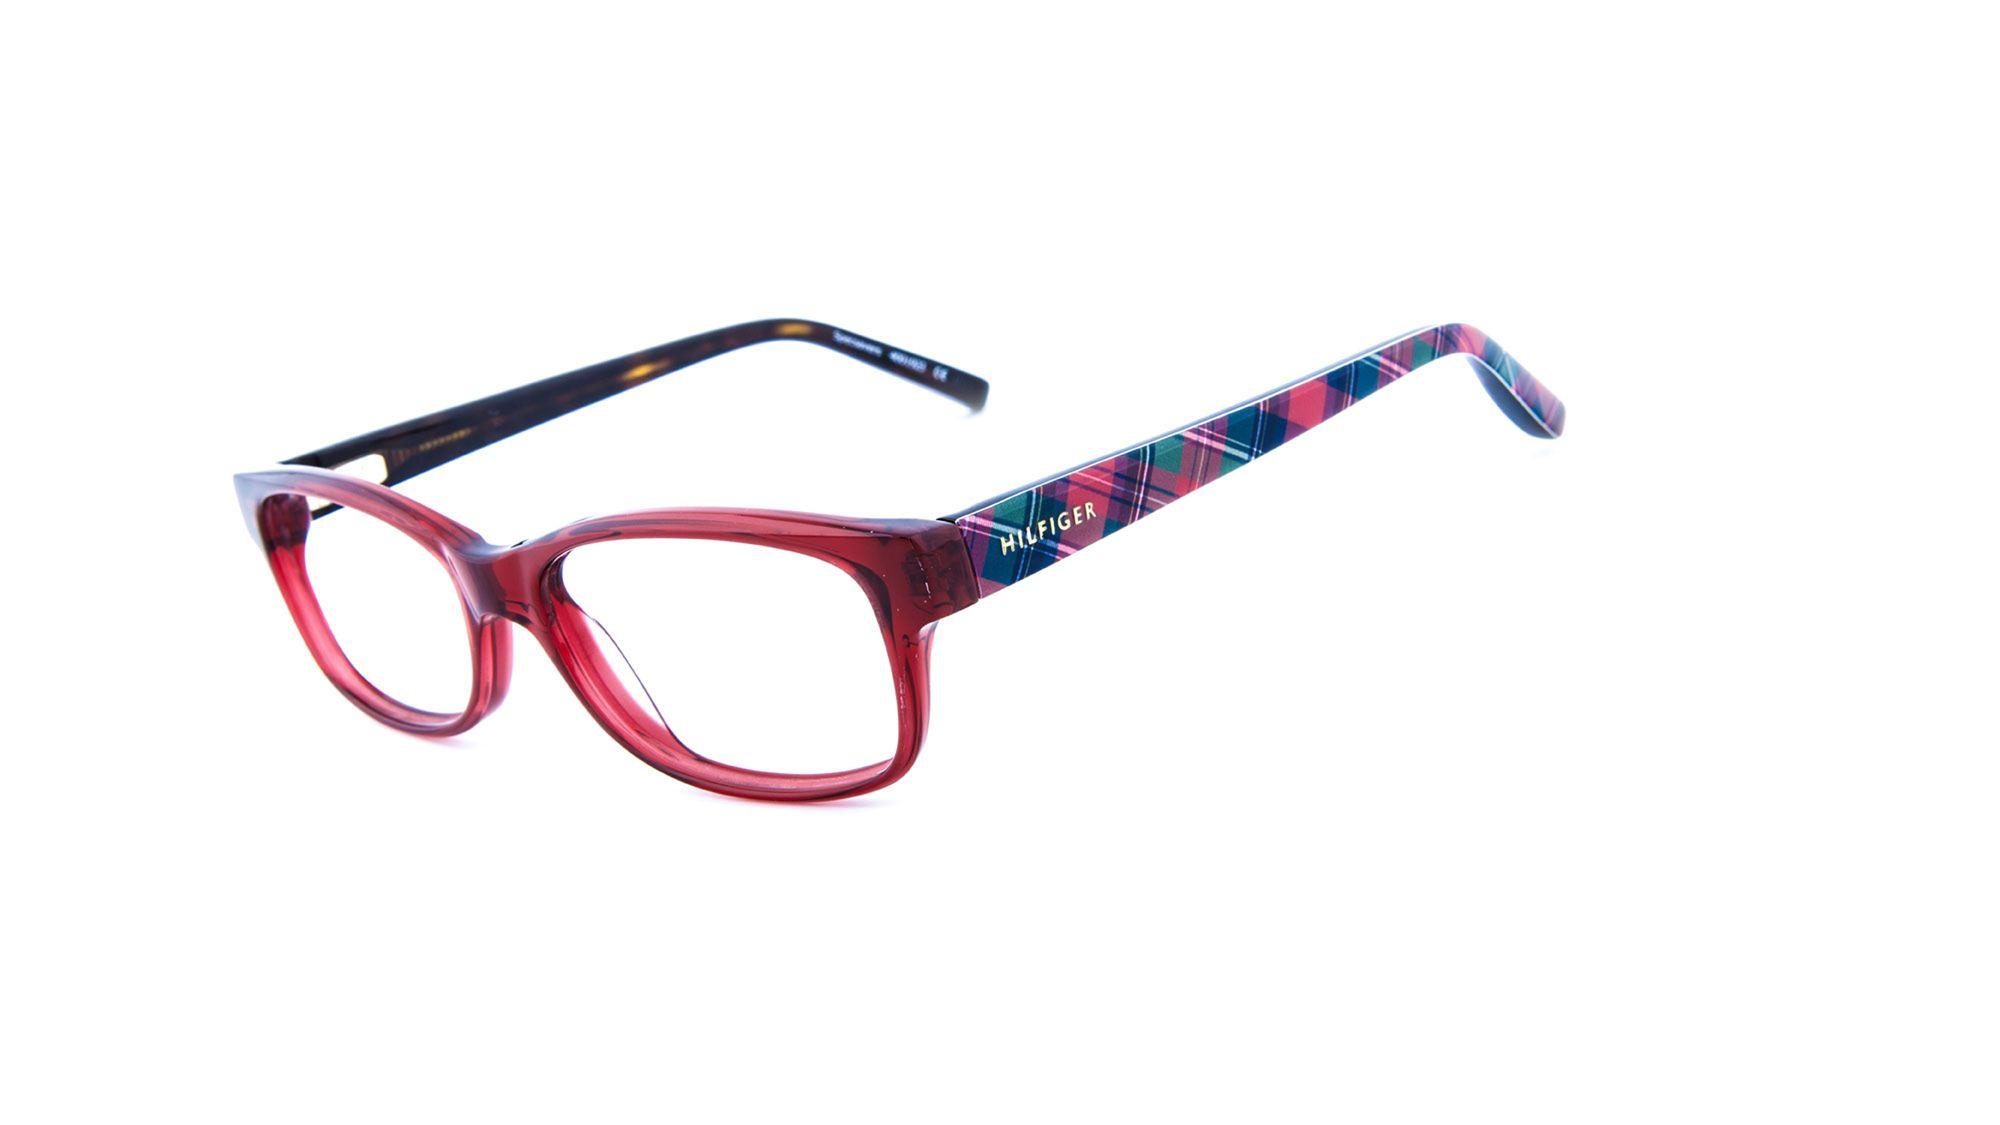 54755849d85 Specsavers Optometrists - Designer Glasses